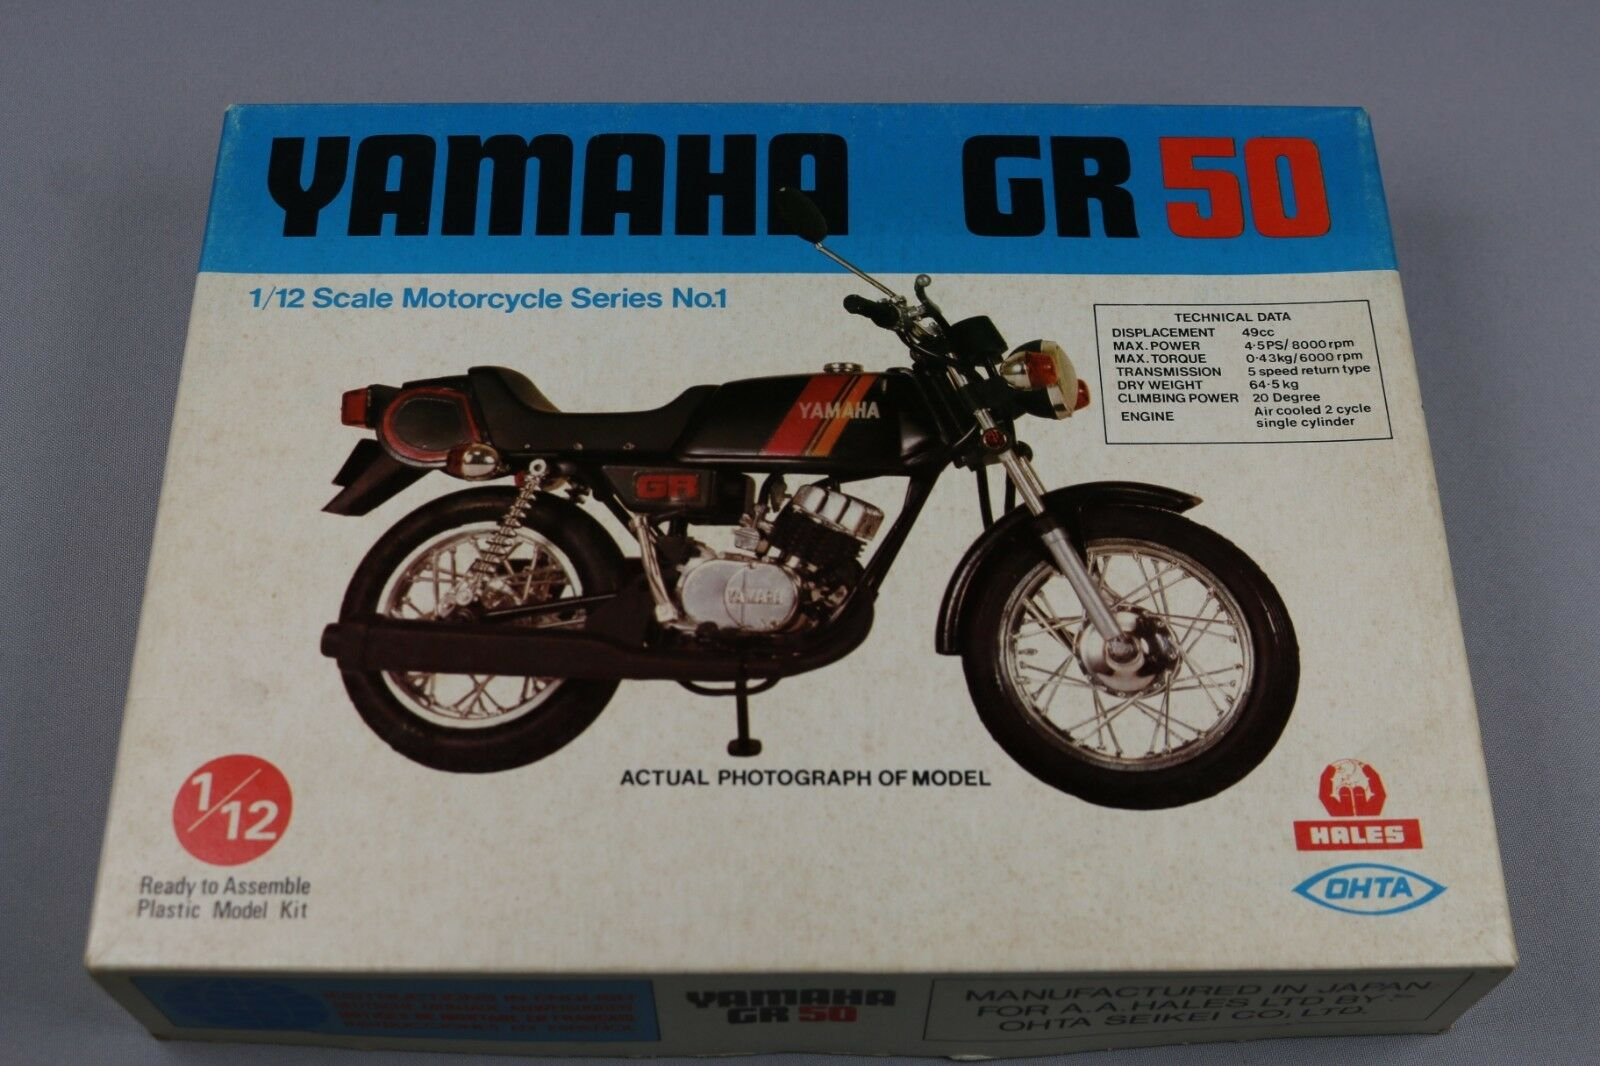 Zf1031 Hales Ohta 112 modellolino Moto M12011 Yamaha Gr50 2 Strokes Serie No. 1